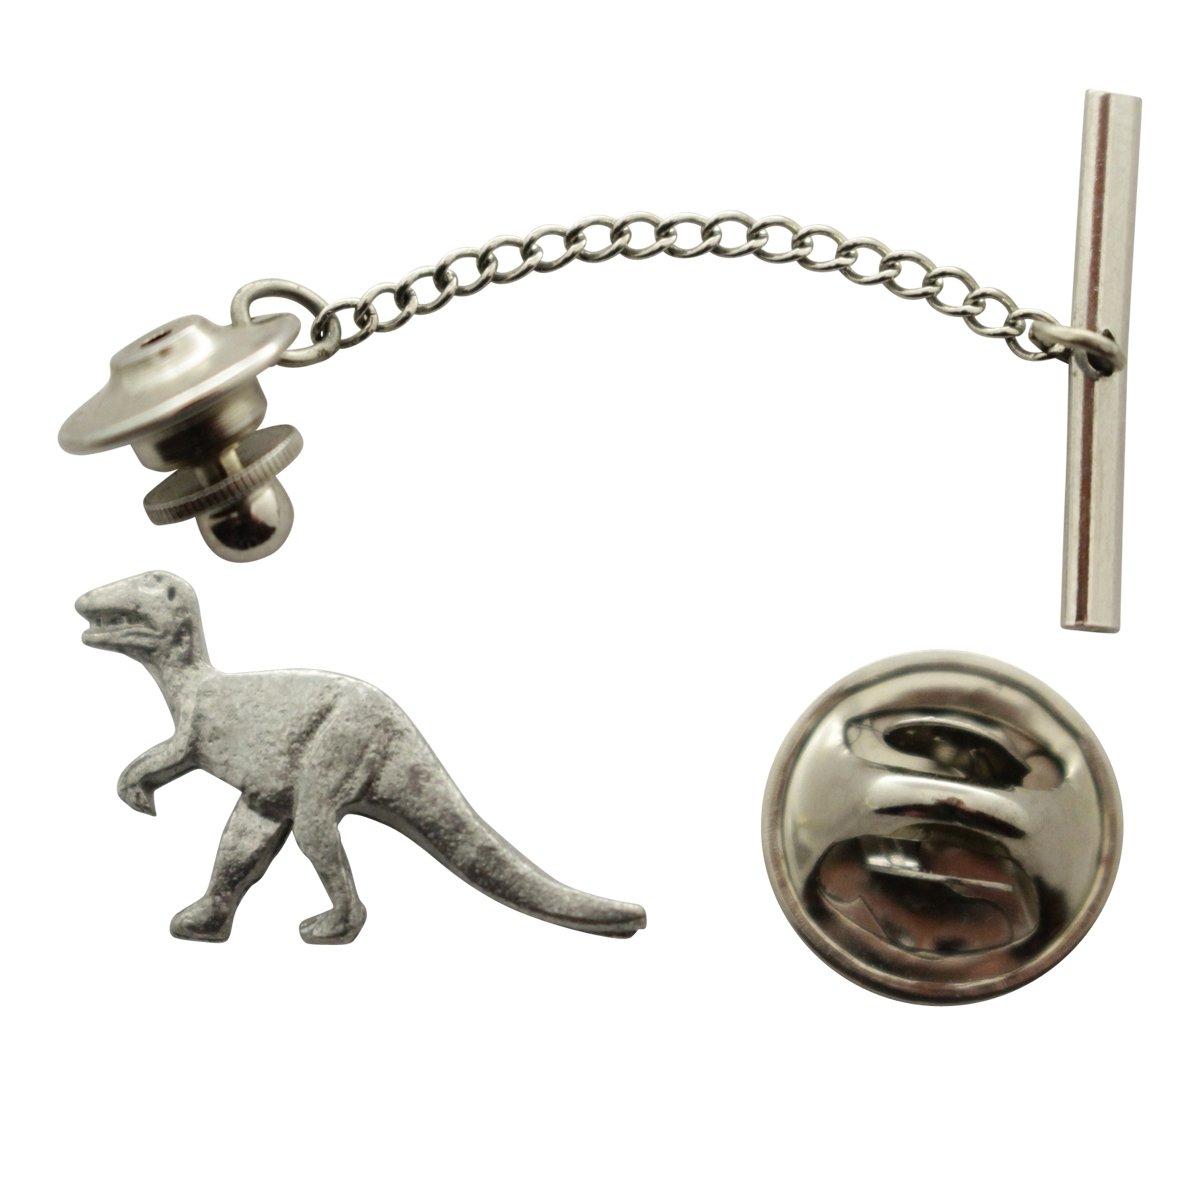 T RexまたはTyrannosaurusタイタック~アンティークピューター~タイタックまたはピン~サラのTreats & Treasures   B01N0ZRLMM